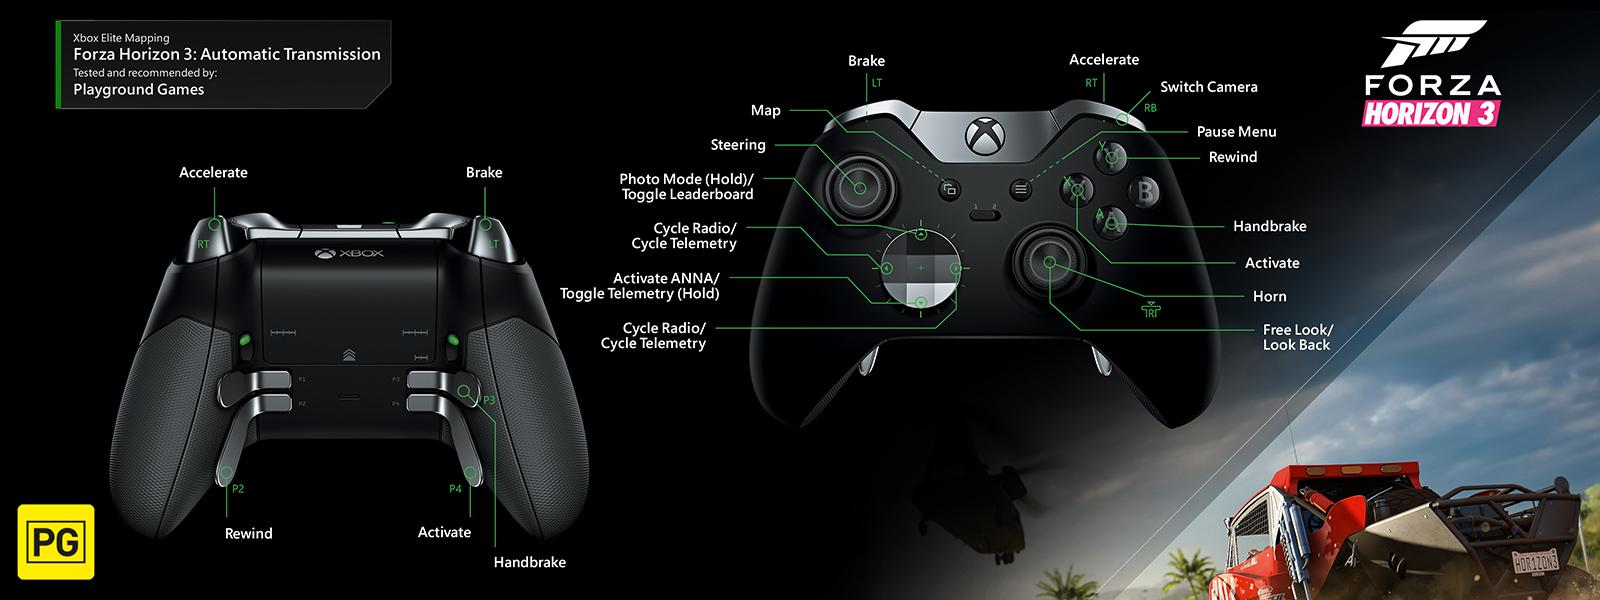 Forza Horizon 3 -Automatic Transmission Elite Mapping